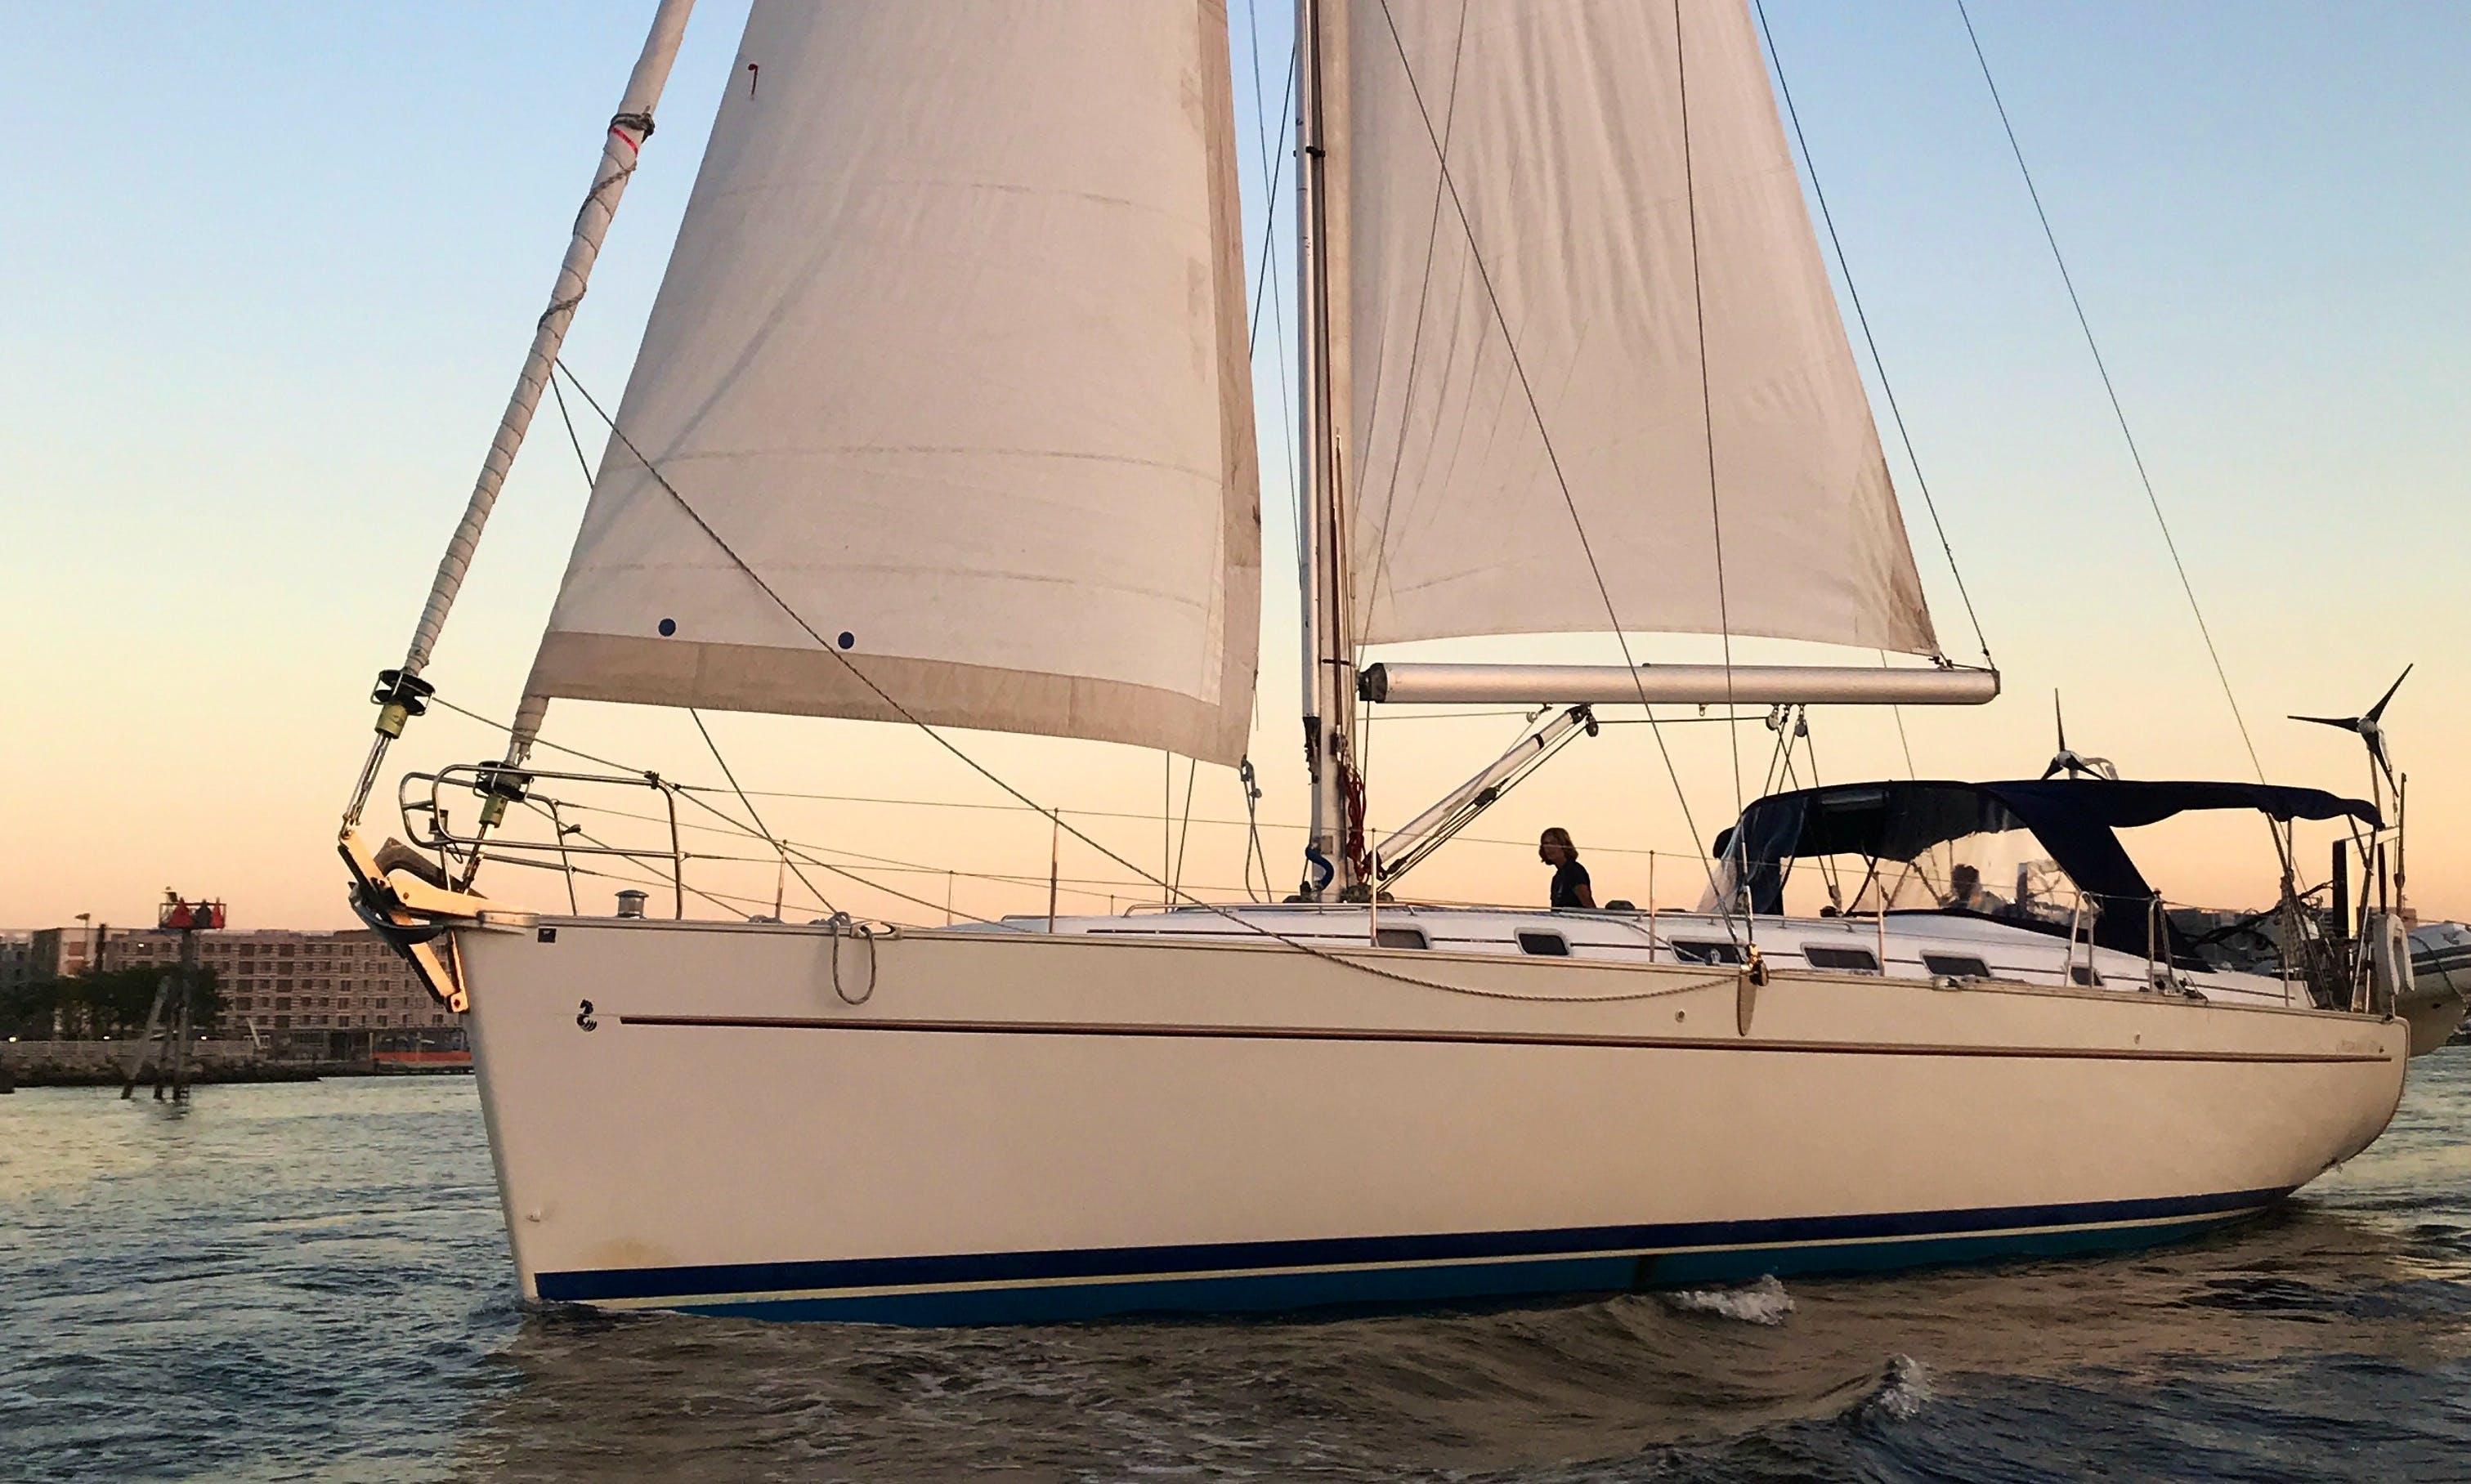 50' Beneteau Sailing Yacht (capacity 12)